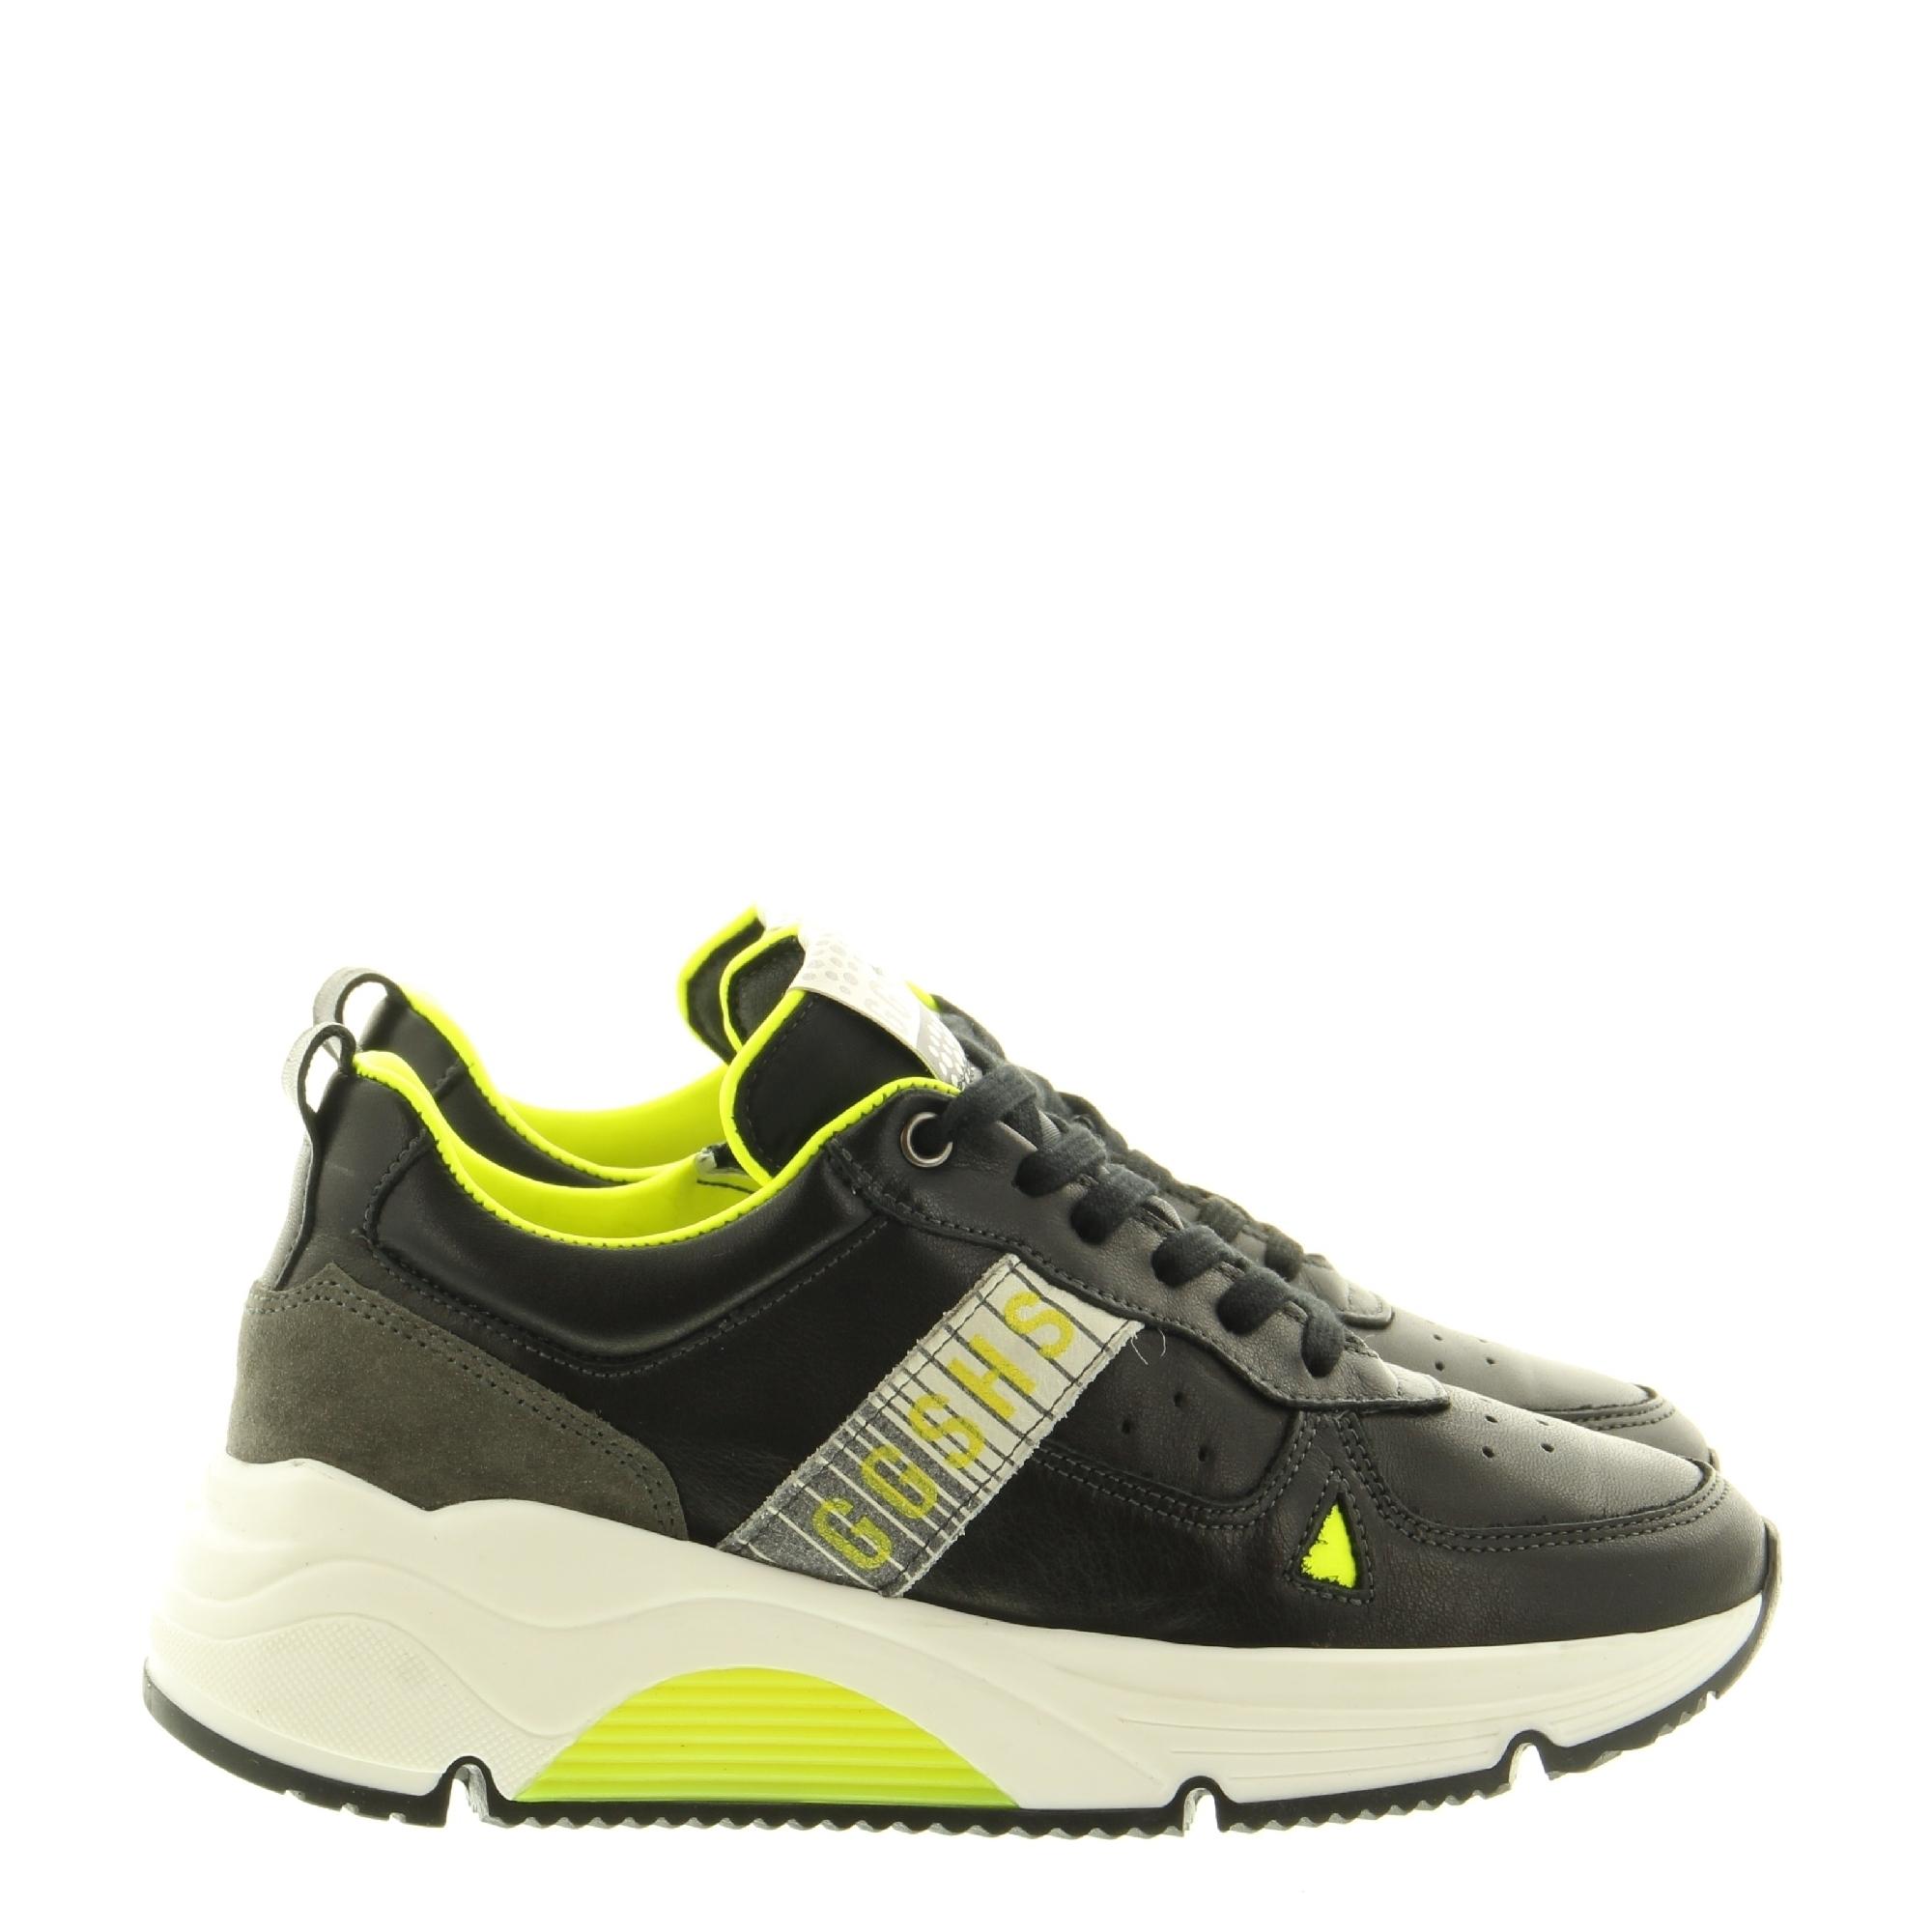 Giga G3582 A11S23 Black Fluor Yellow